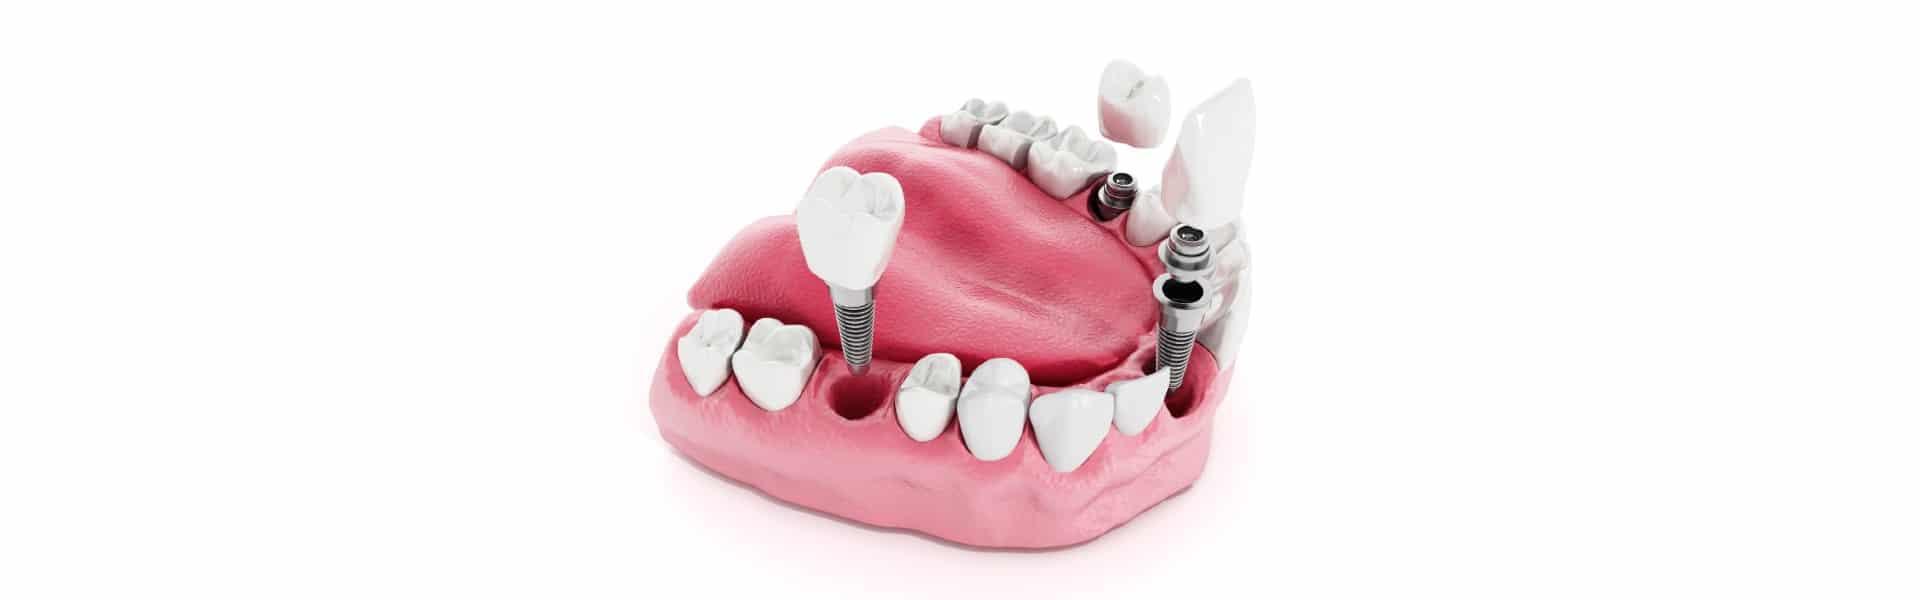 Marka zubnih implantata - Marchio di impianti dentali - Straumann - Poliklinika Smile Opatija